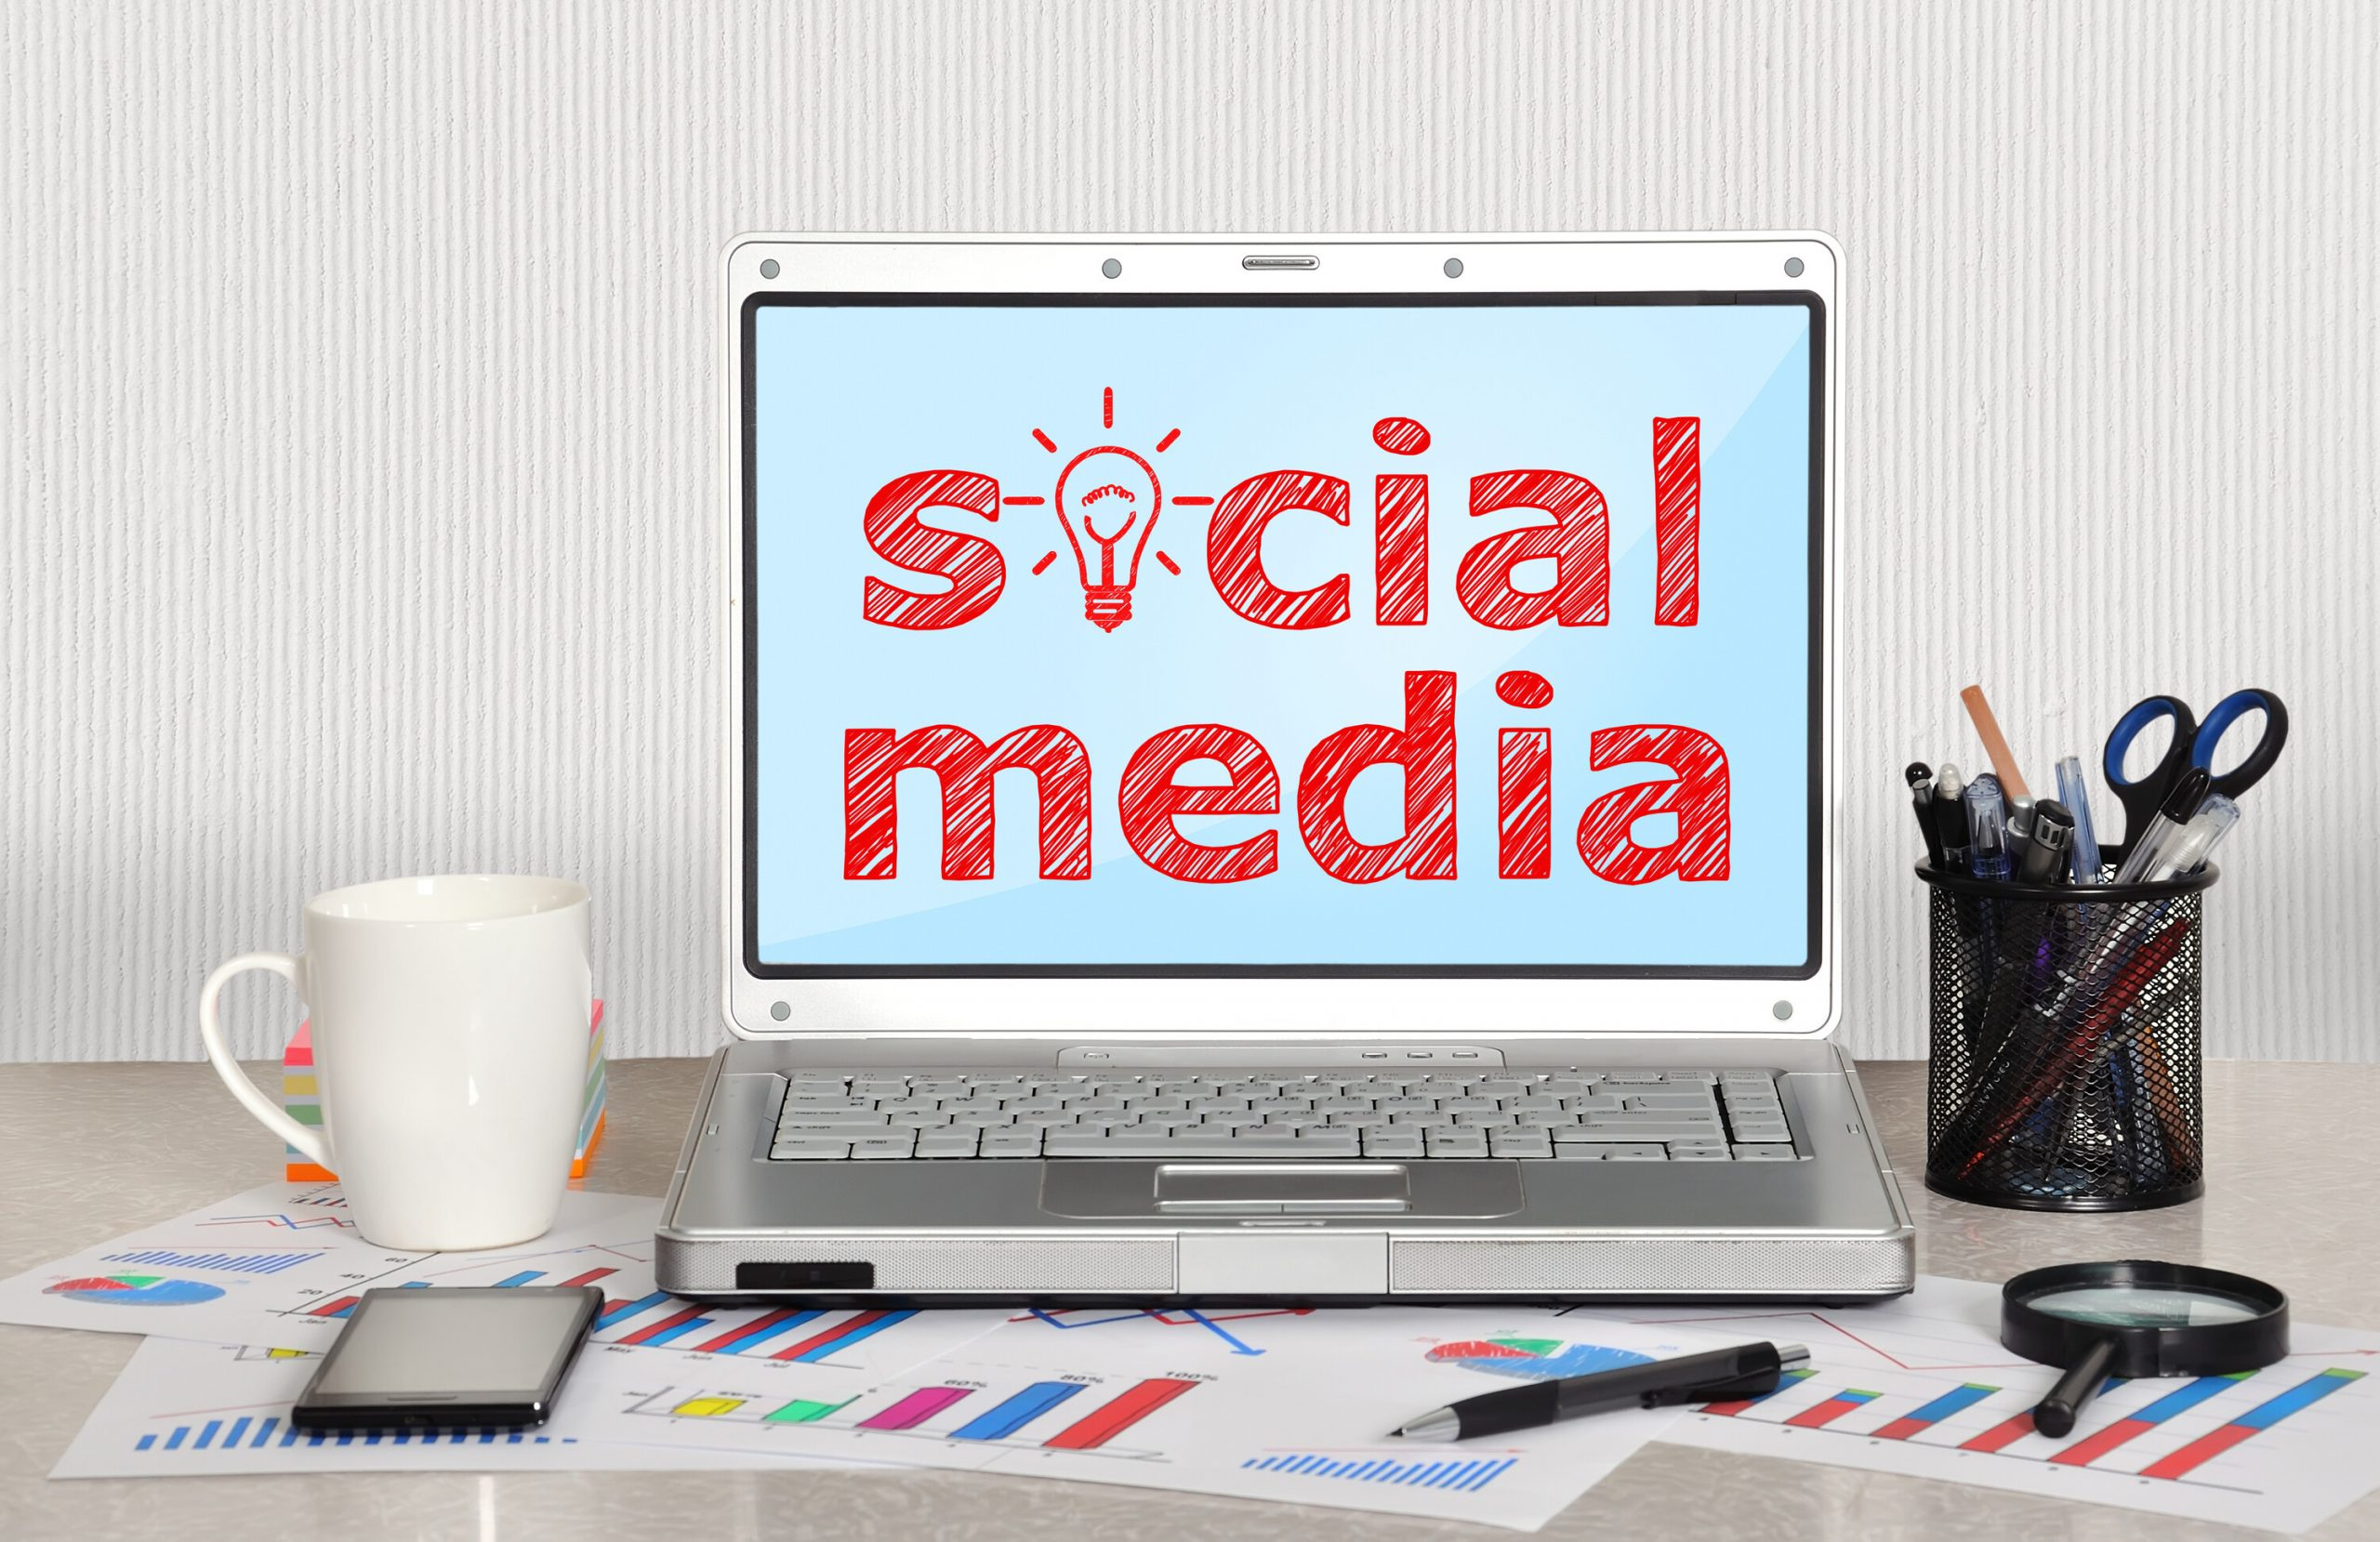 Use Social Media to improve your job hunt!